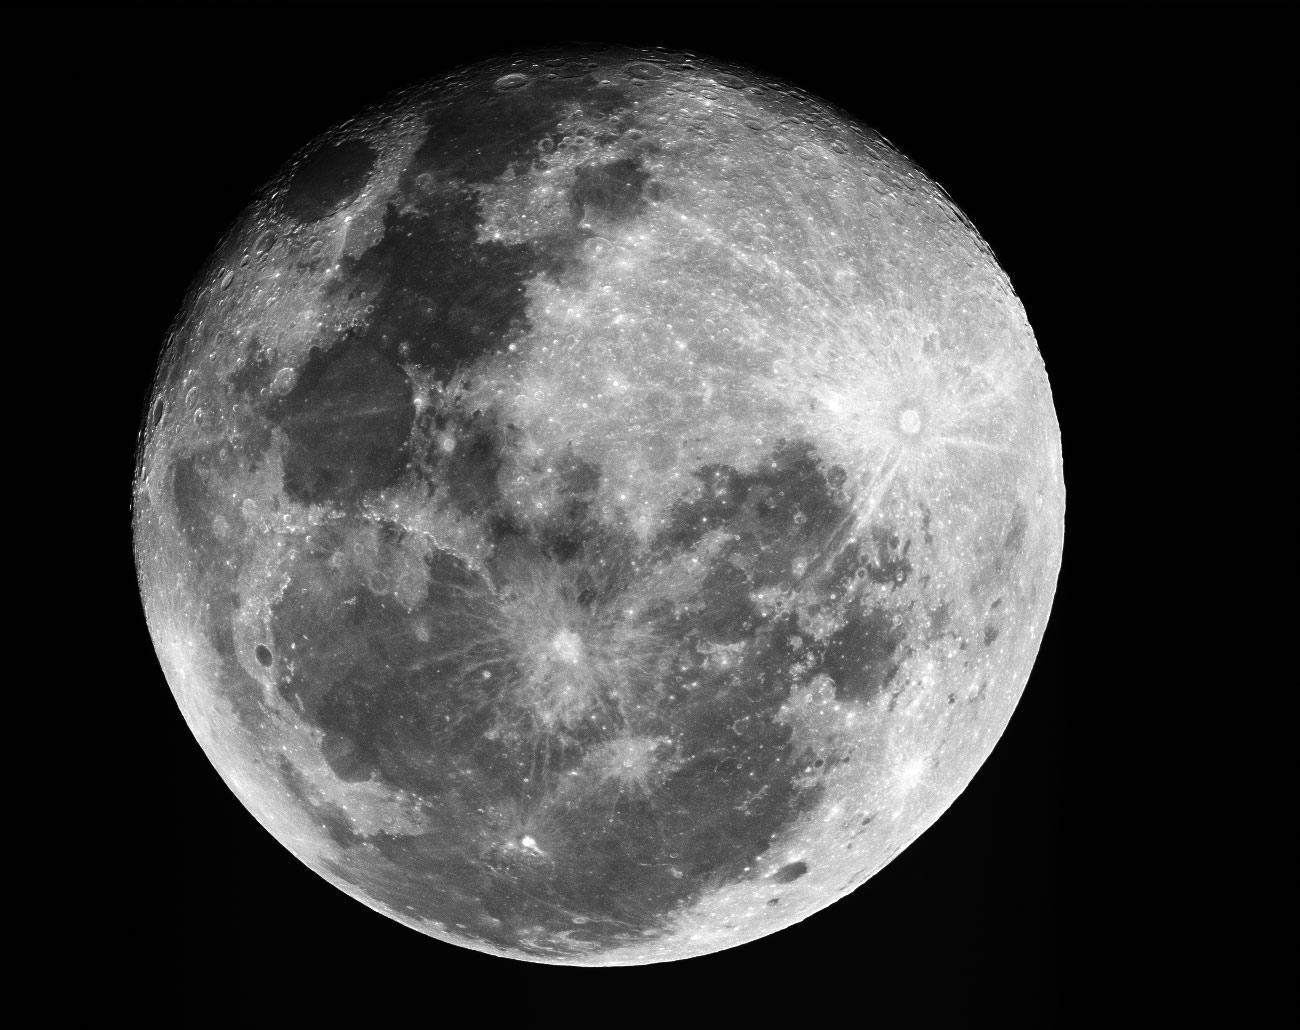 8dbf5801 Por que a Lua está ficando mais distante da Terra?